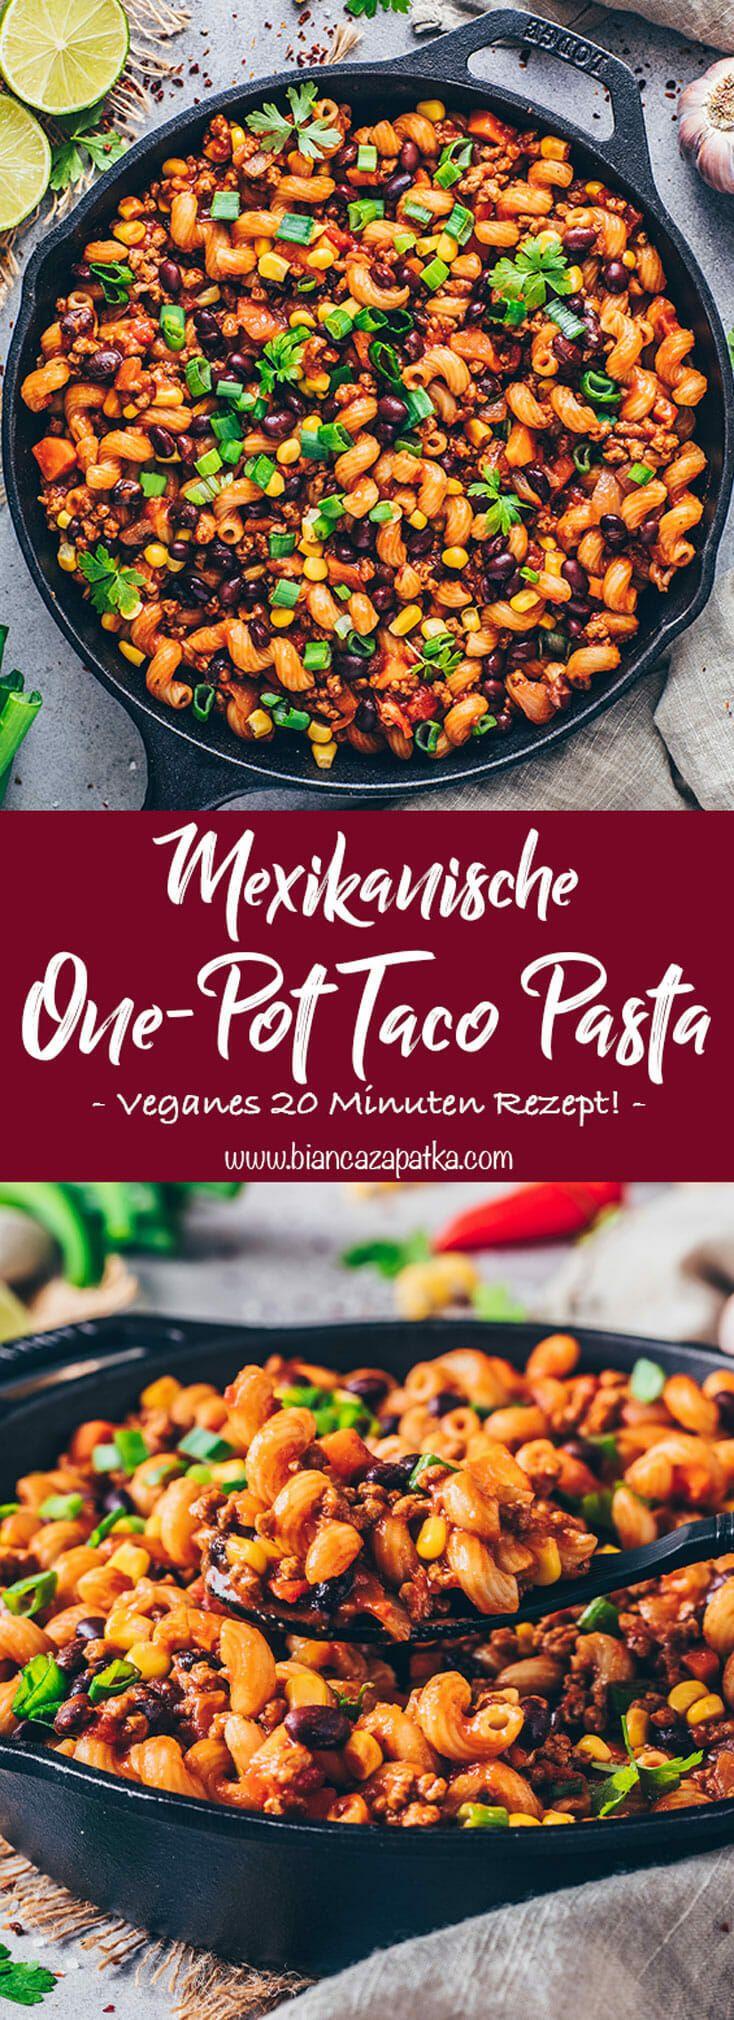 Mexikanische One-Pot Pasta (Vegan & Einfach) - Bianca Zapatka | Rezepte